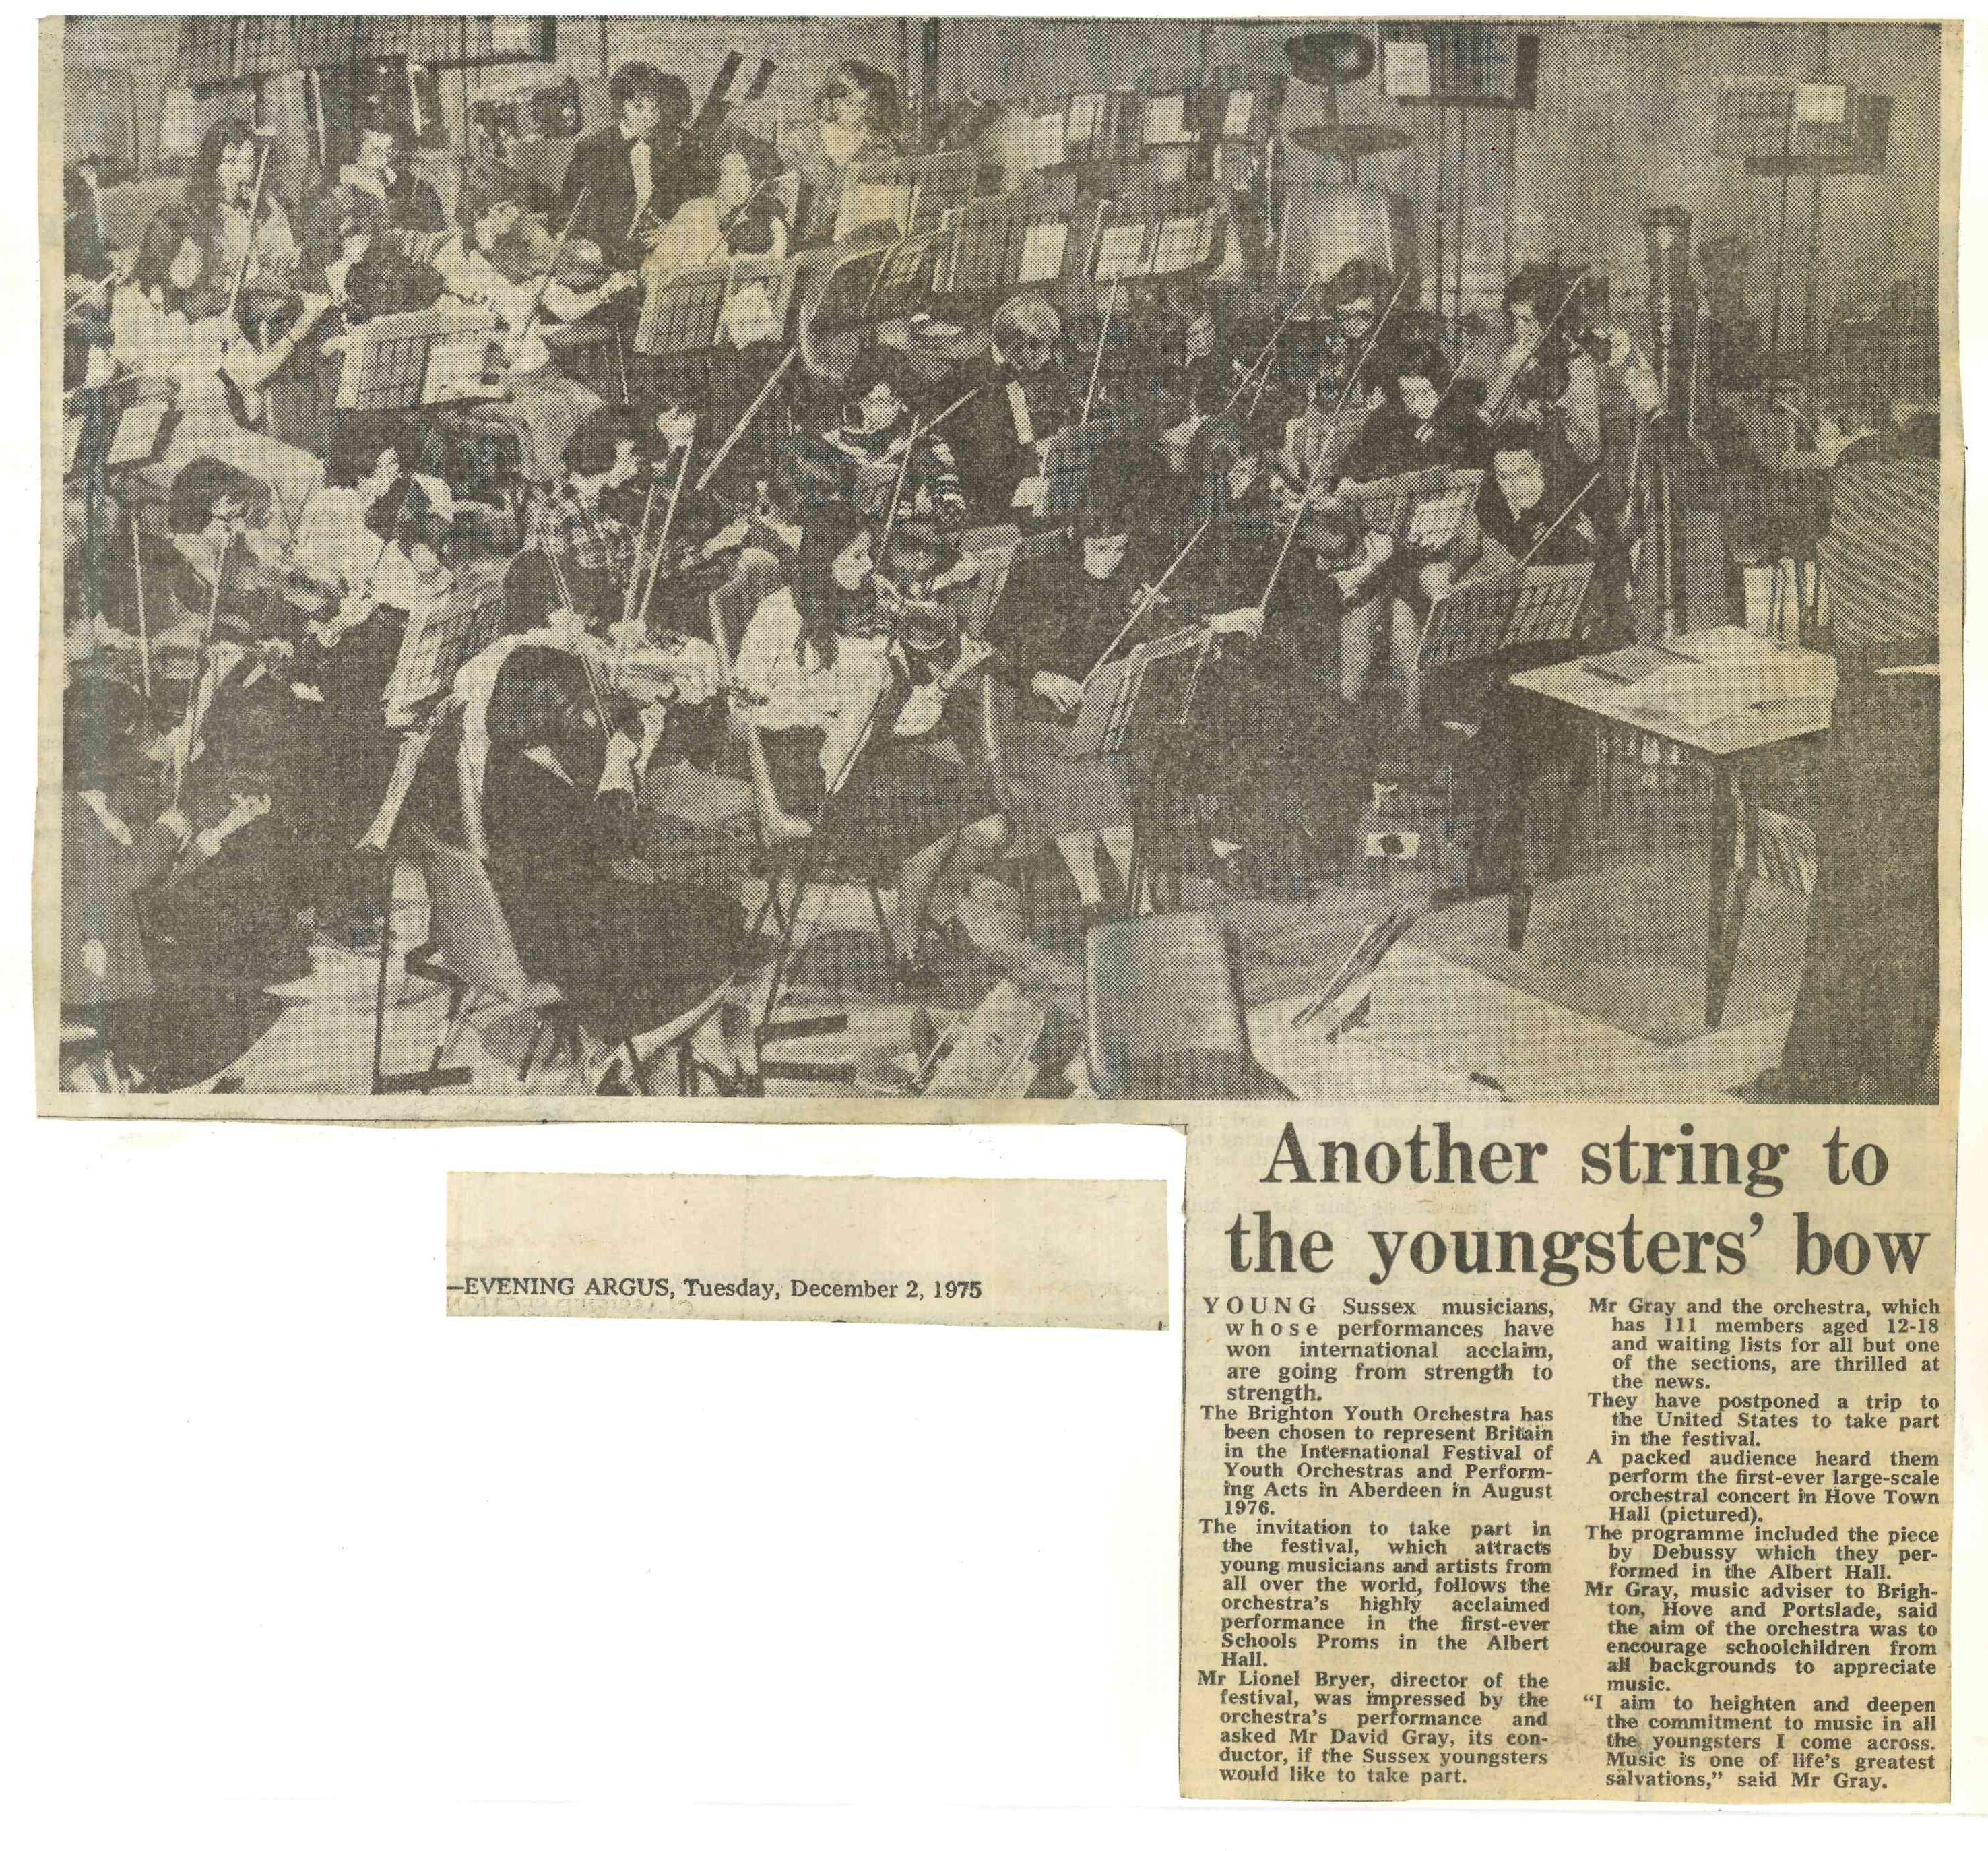 00030-Evening Argus, 2nd December 1975.jpg